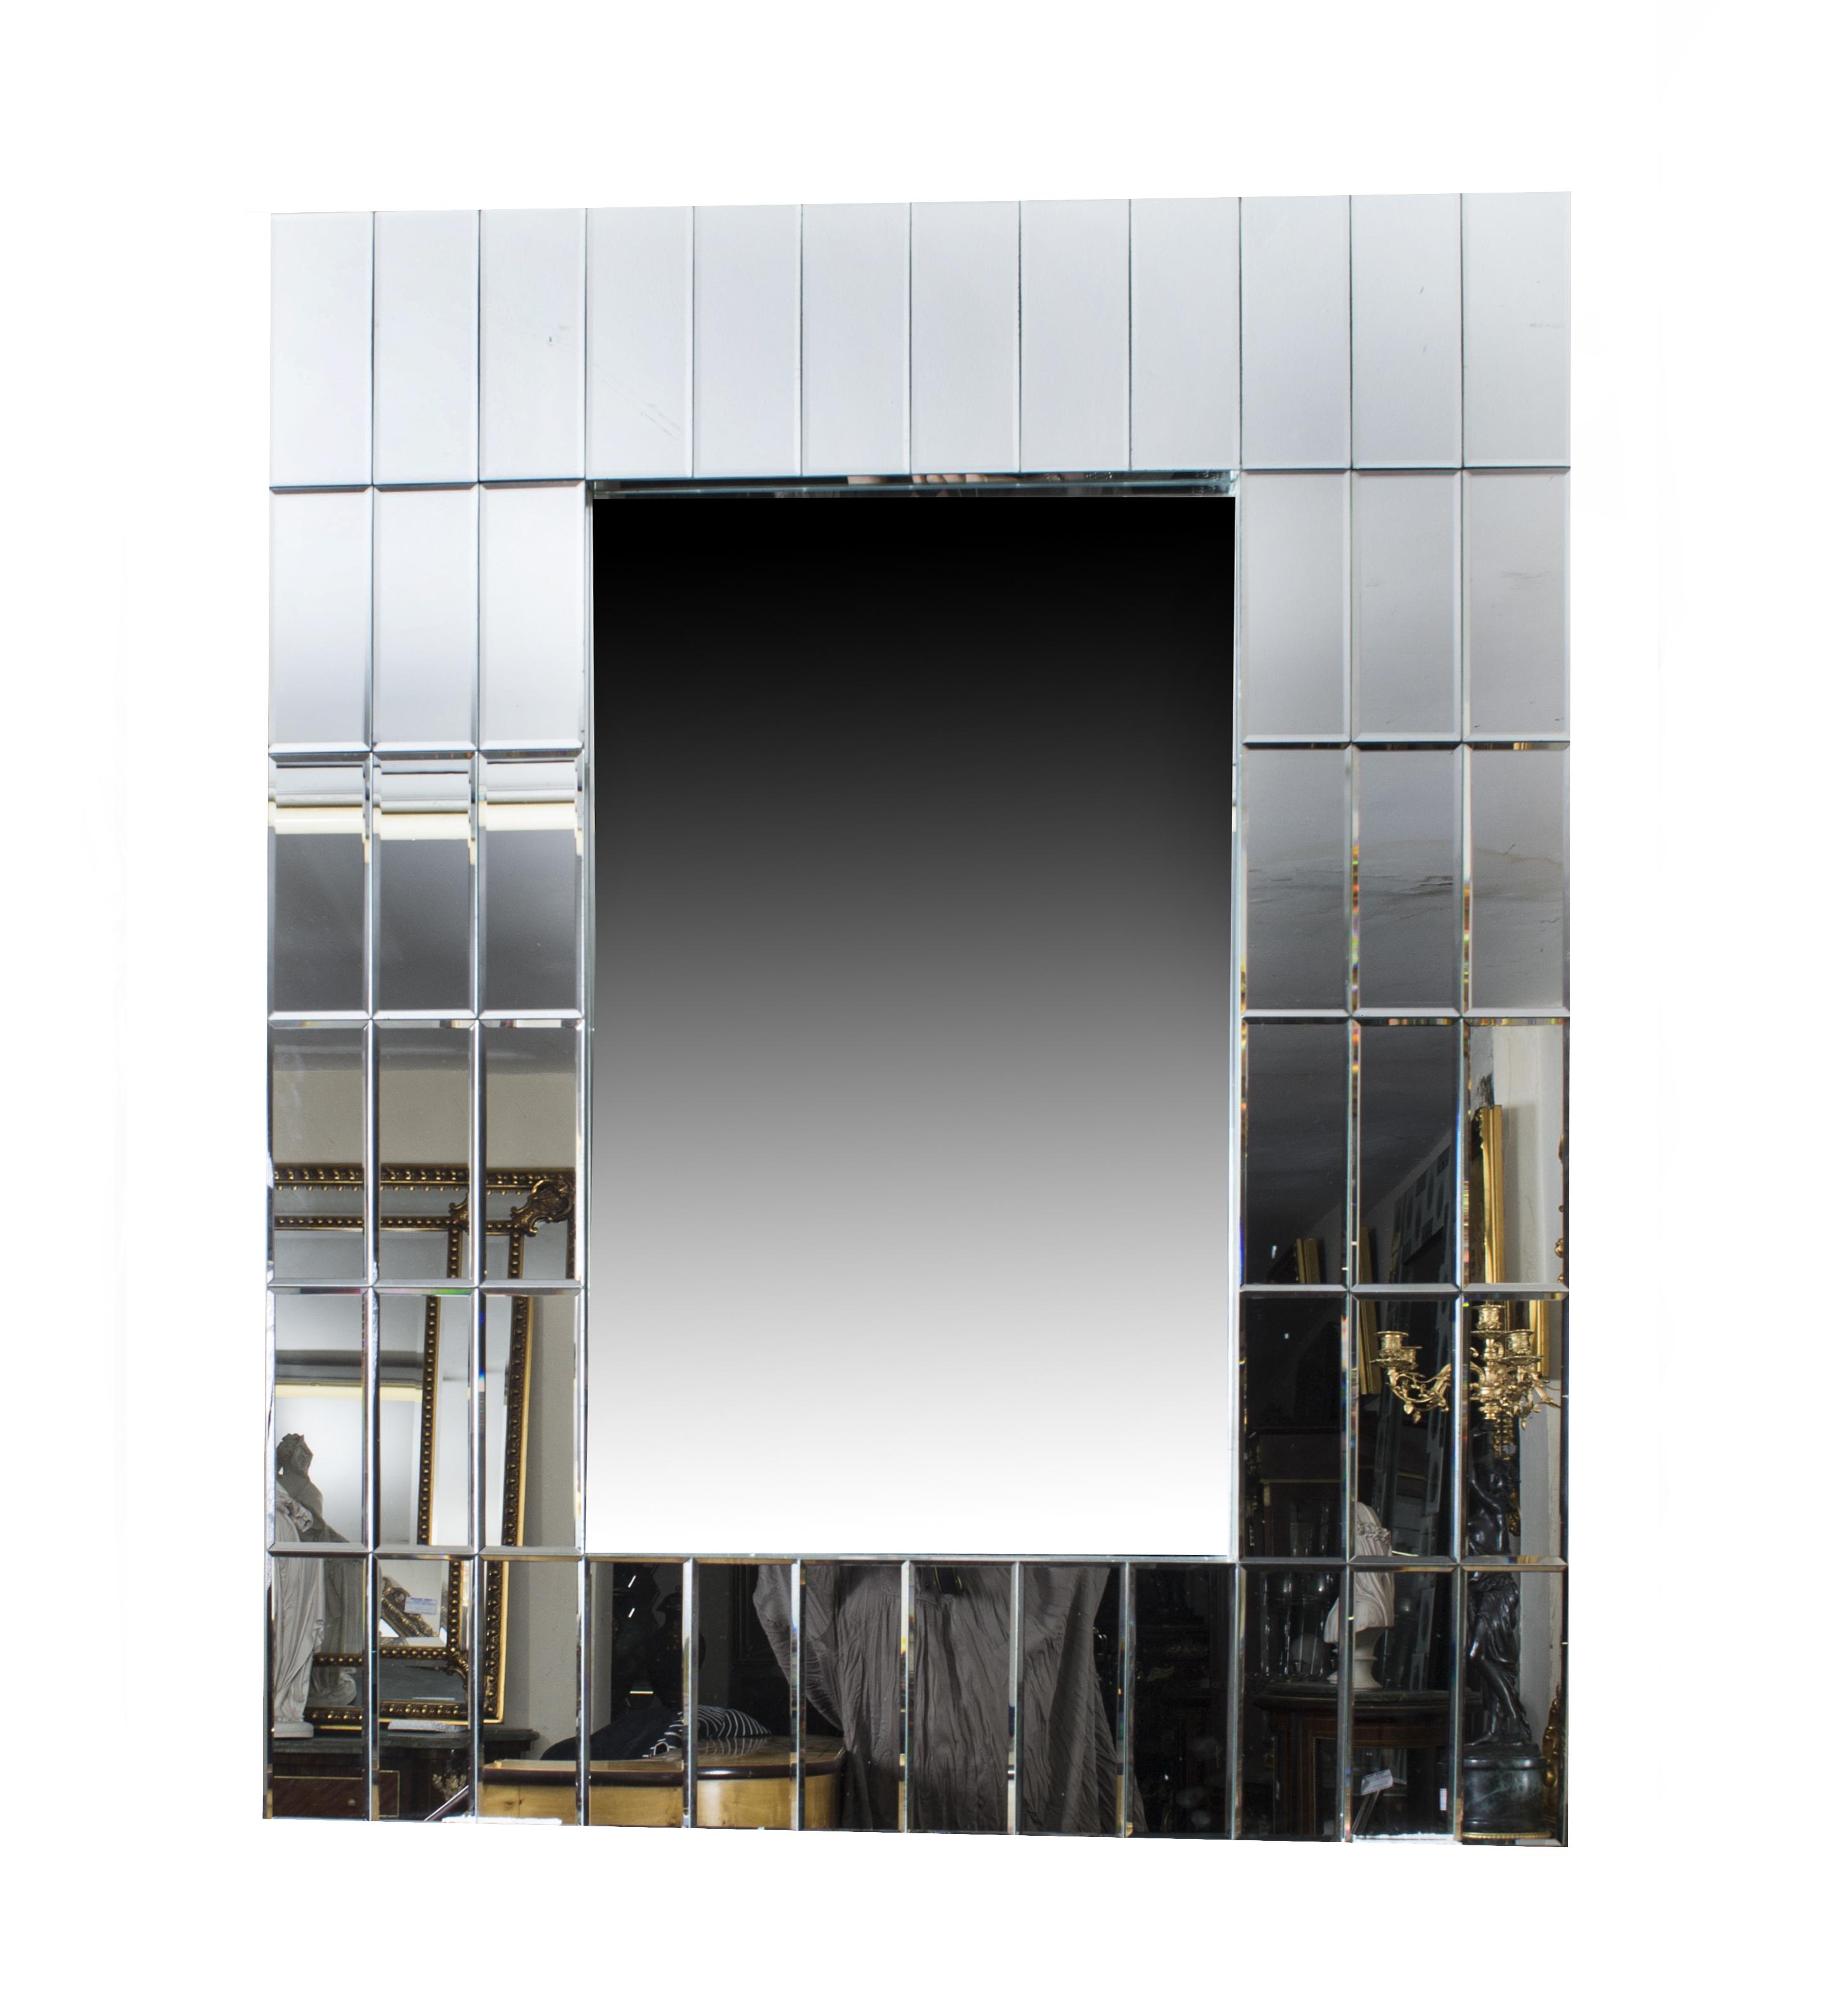 Super chic large rectangular art deco mirror 120 x 90 cm for Miroir 90 x 120